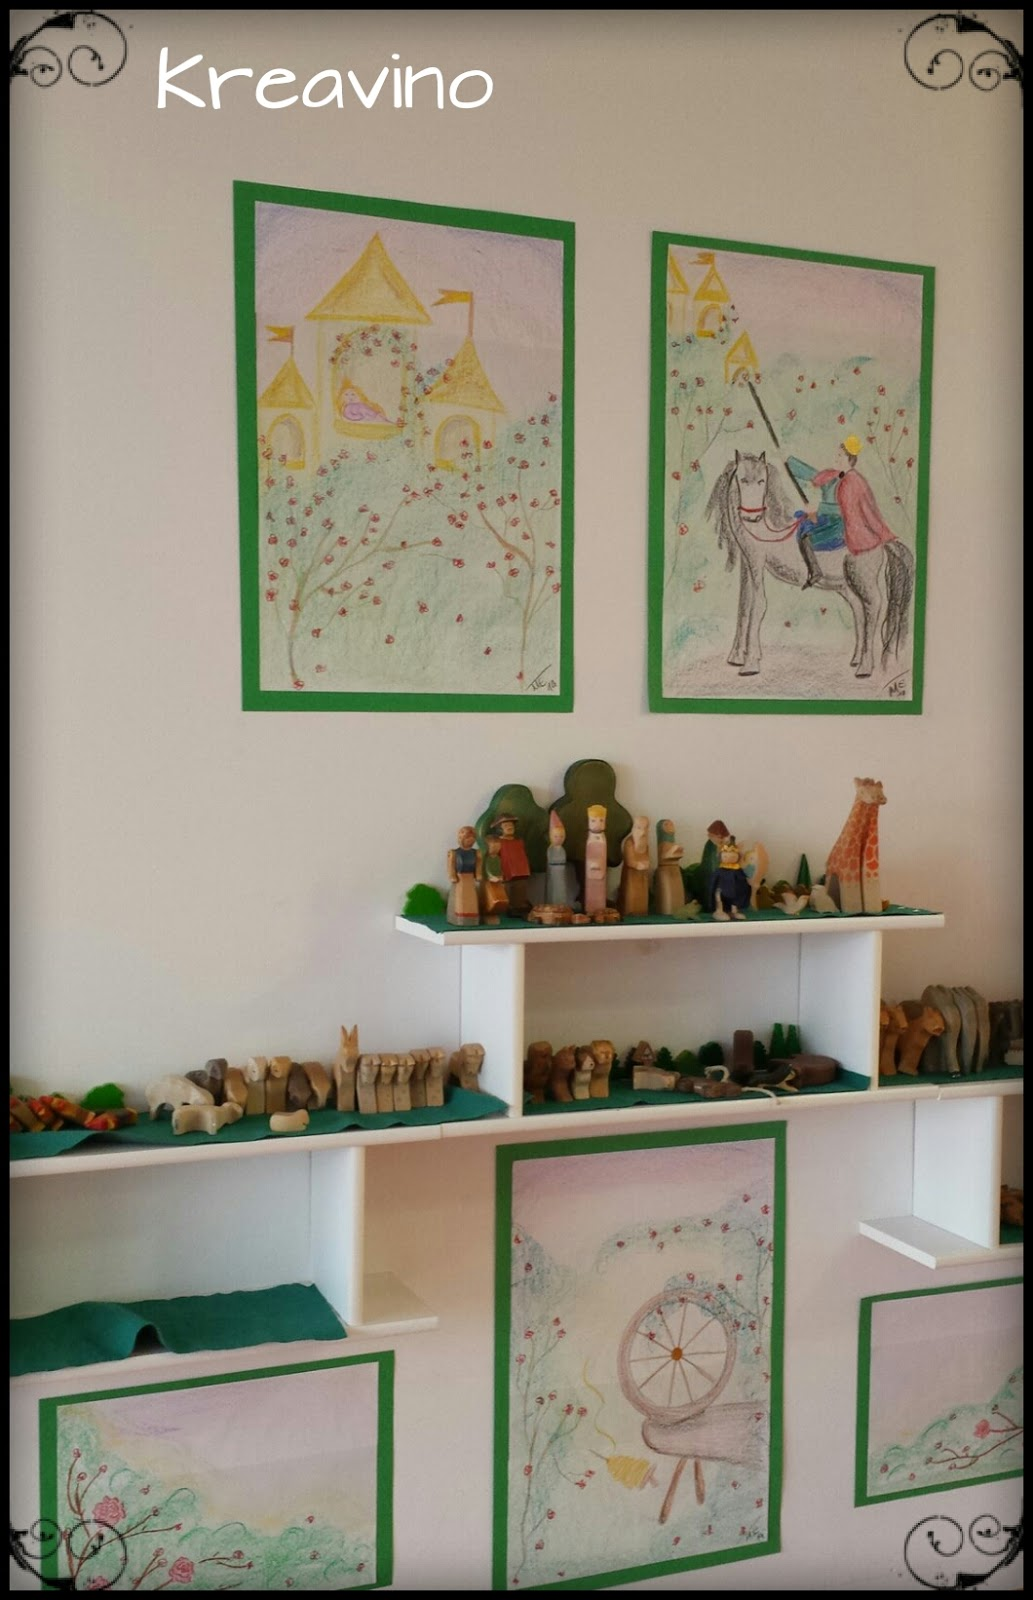 Mrchenbilder Kinderzimmer: Fensterbild frida fr?hst?ckt arena verlag ...